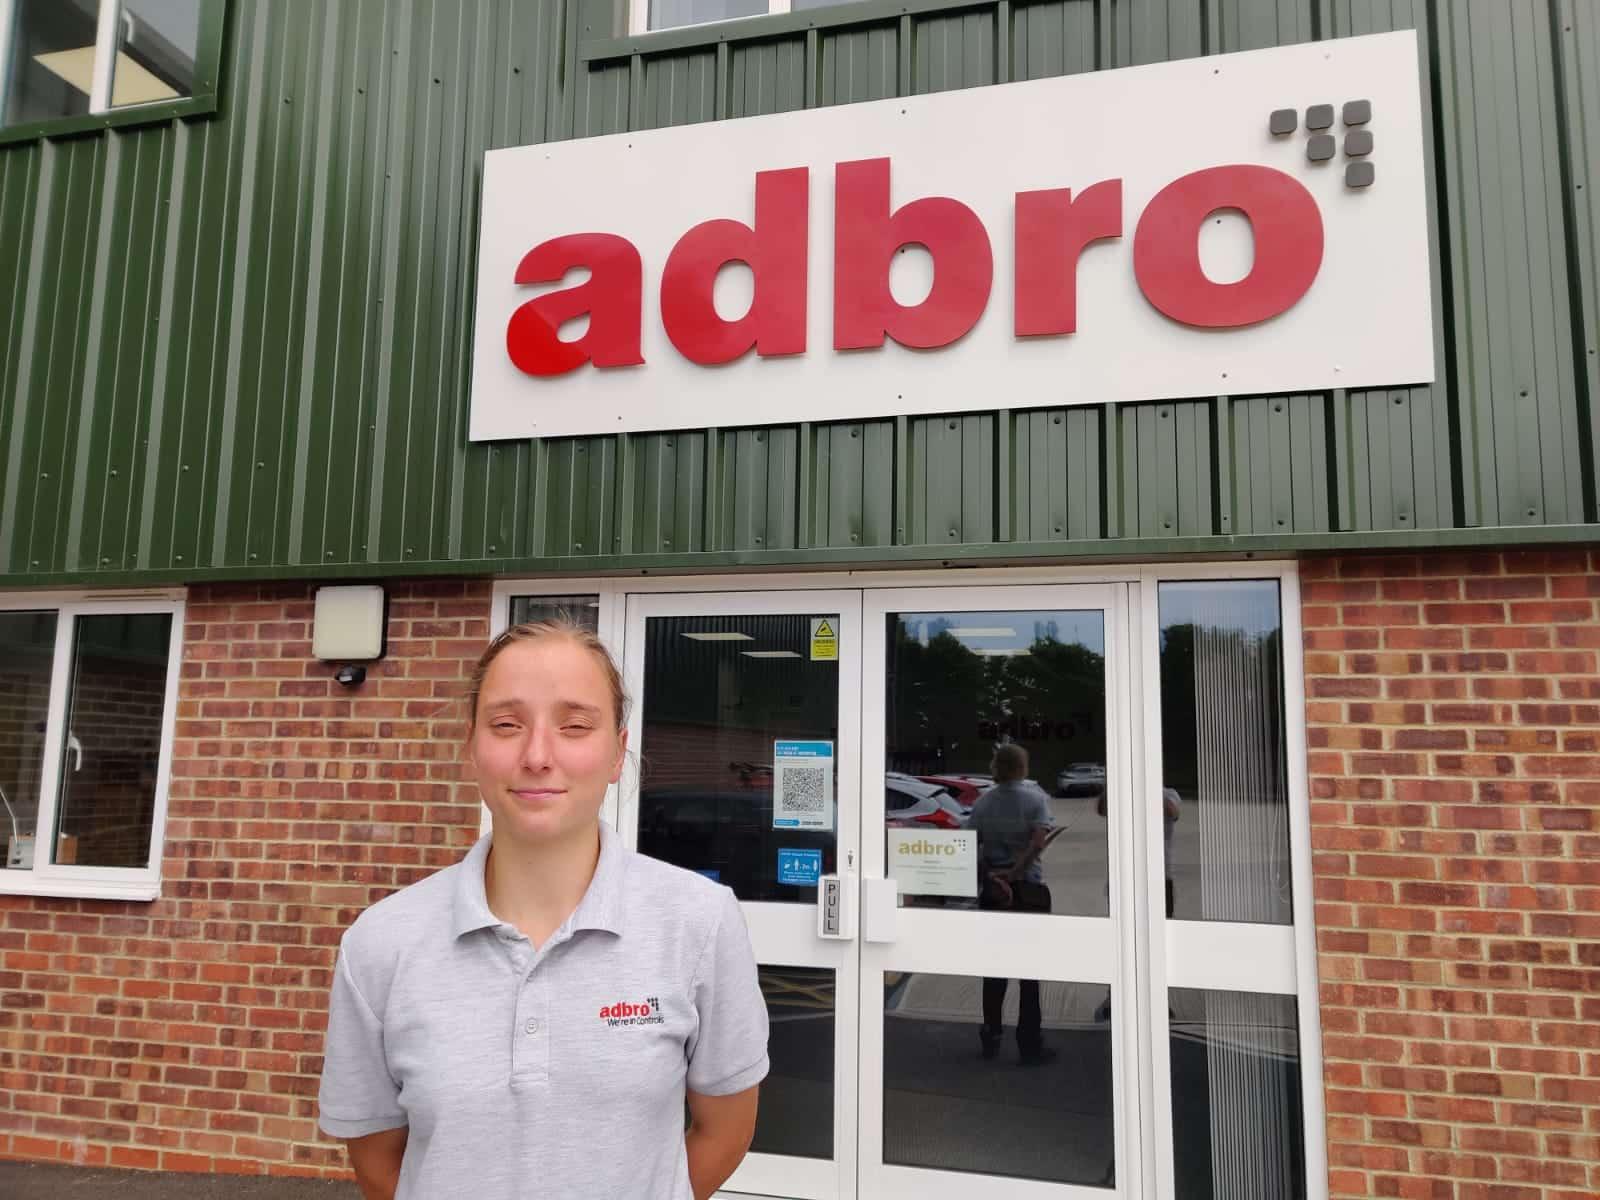 Apprentice Chelsea stood outside Adbro Controls Ltd